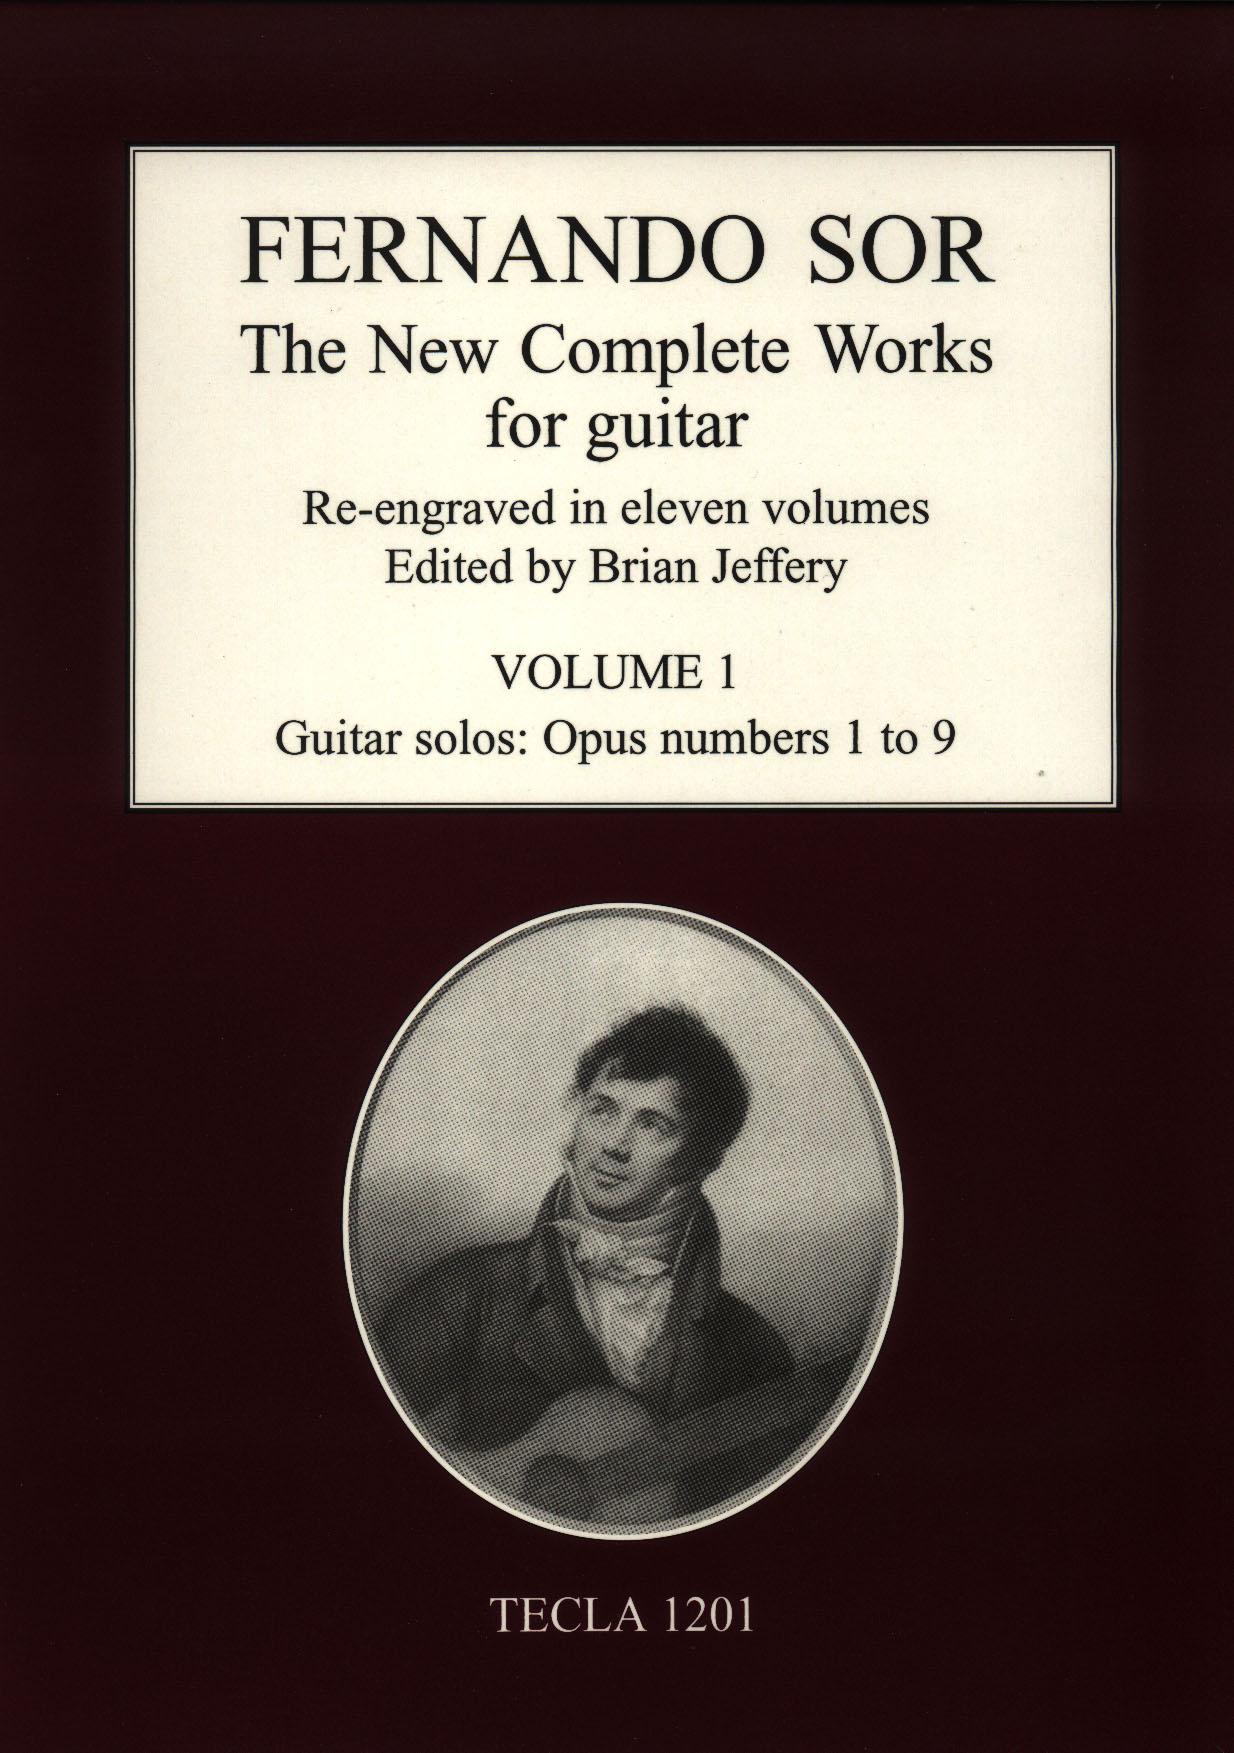 Sor - New Complete Works Vol.1 Image